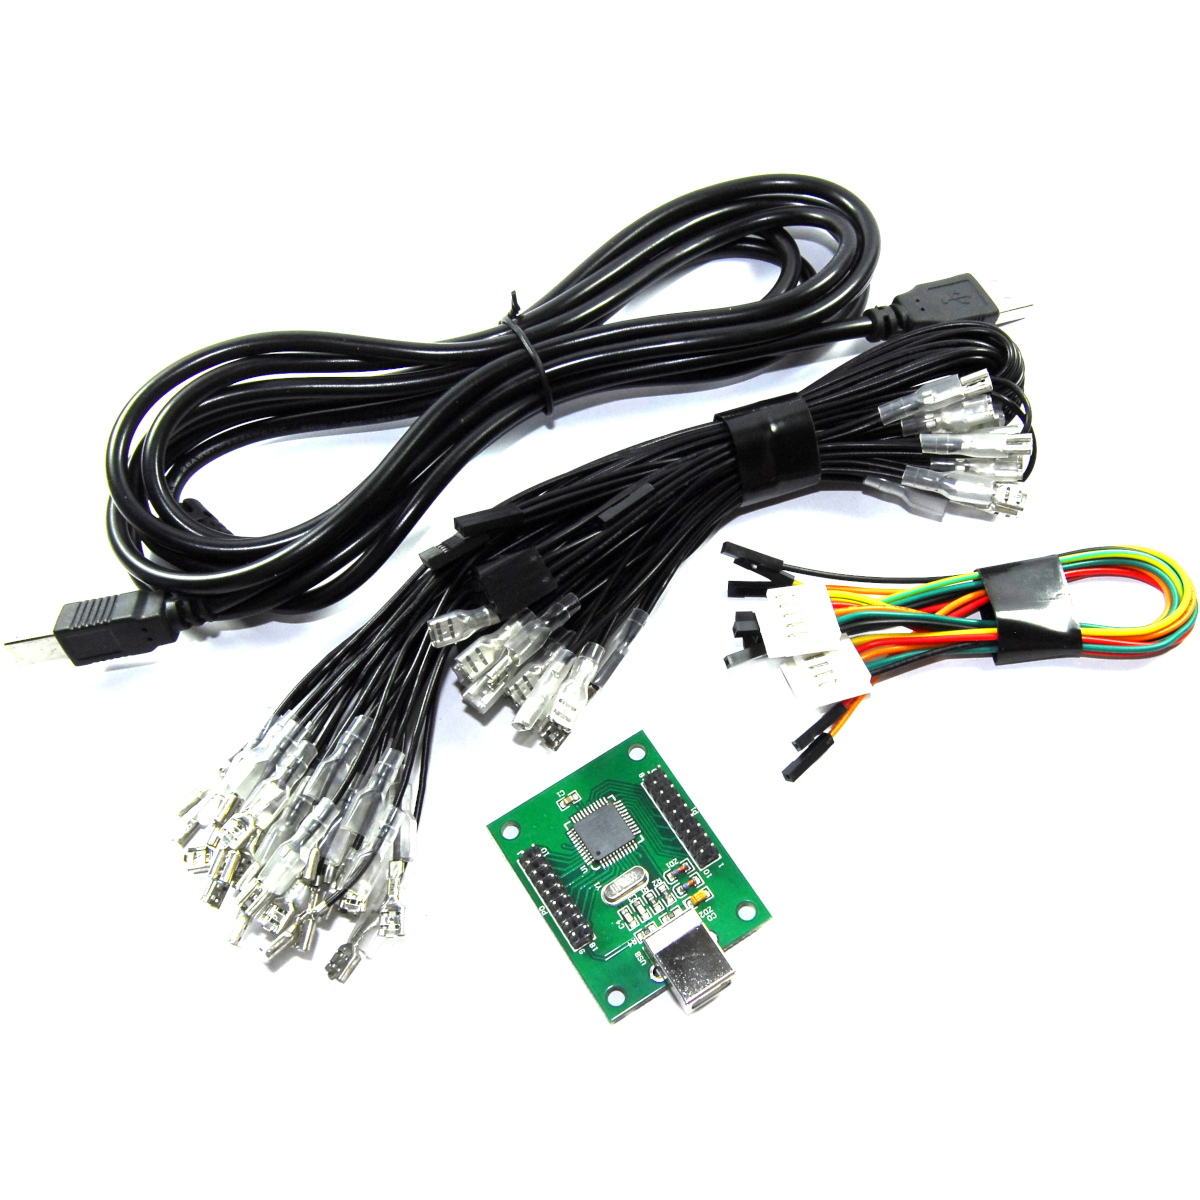 USB Arcade Gamepad Set Joystick Encoder MAME Turbo Panel Flux Workshop